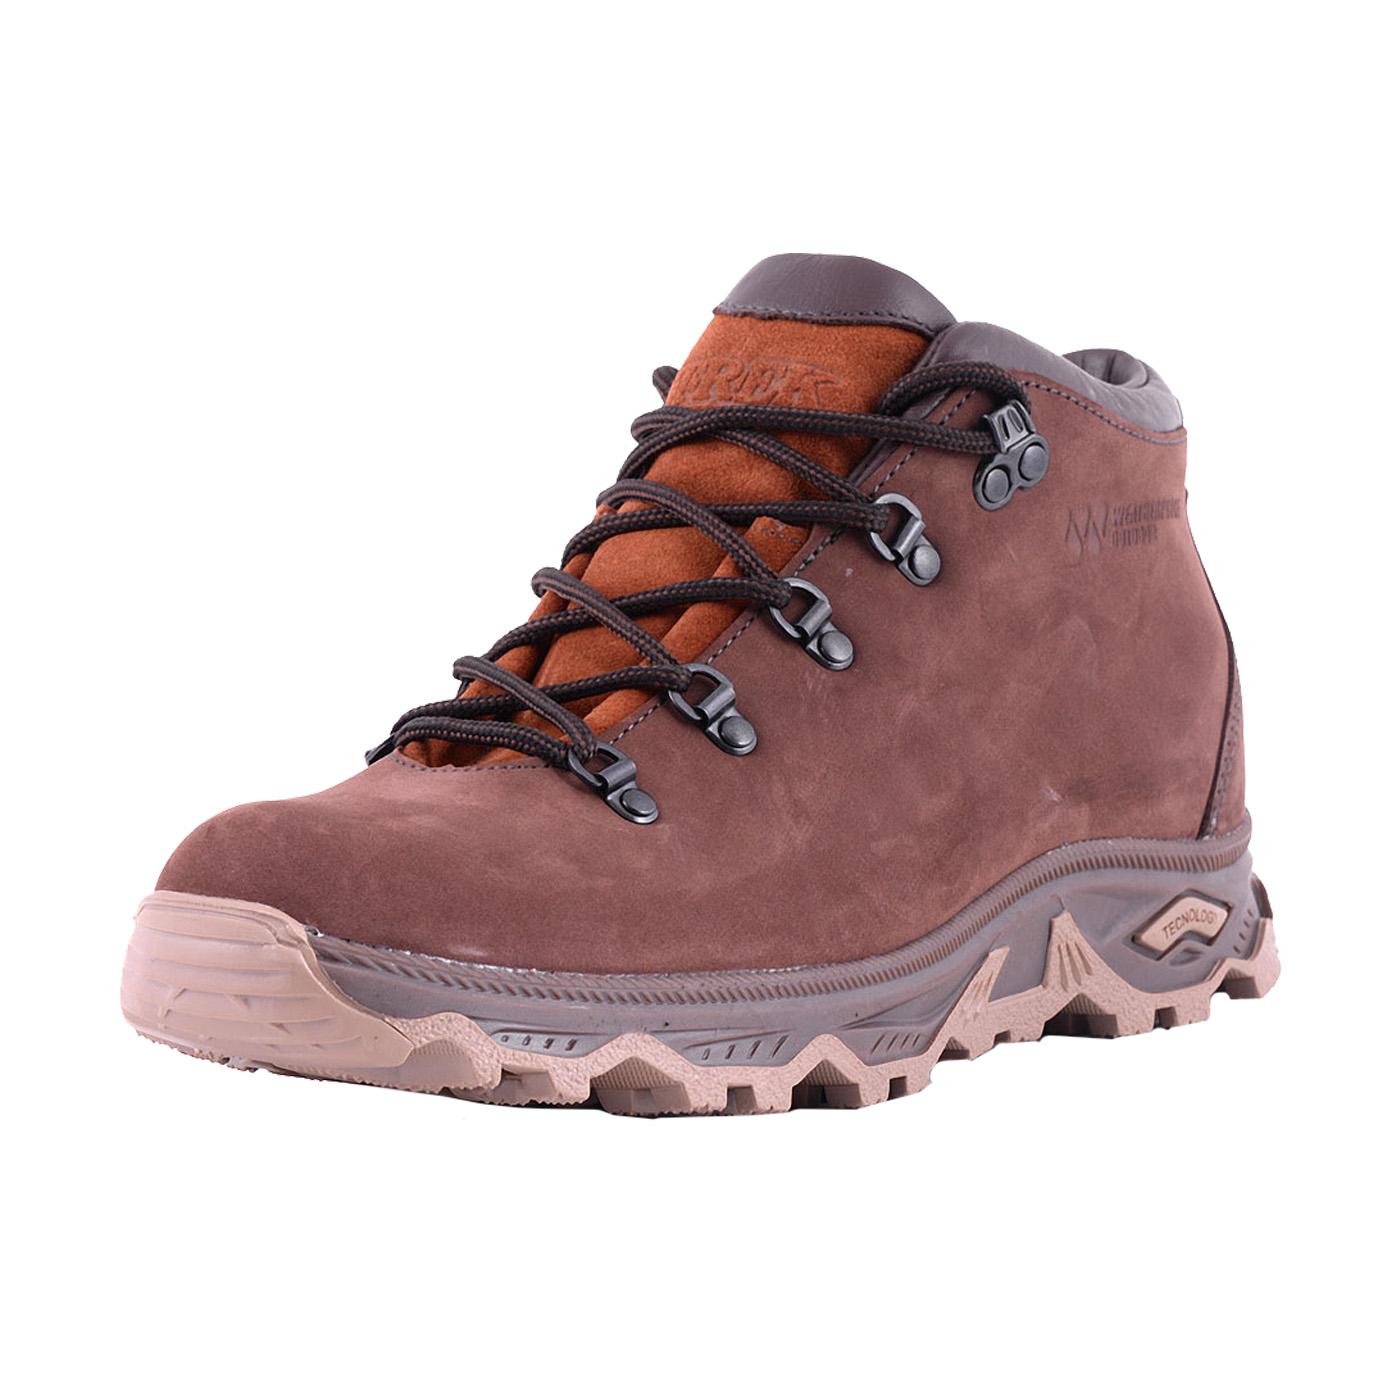 Ботинки TREK Andes6 (шерст.мех), Ботинки - арт. 1129370177